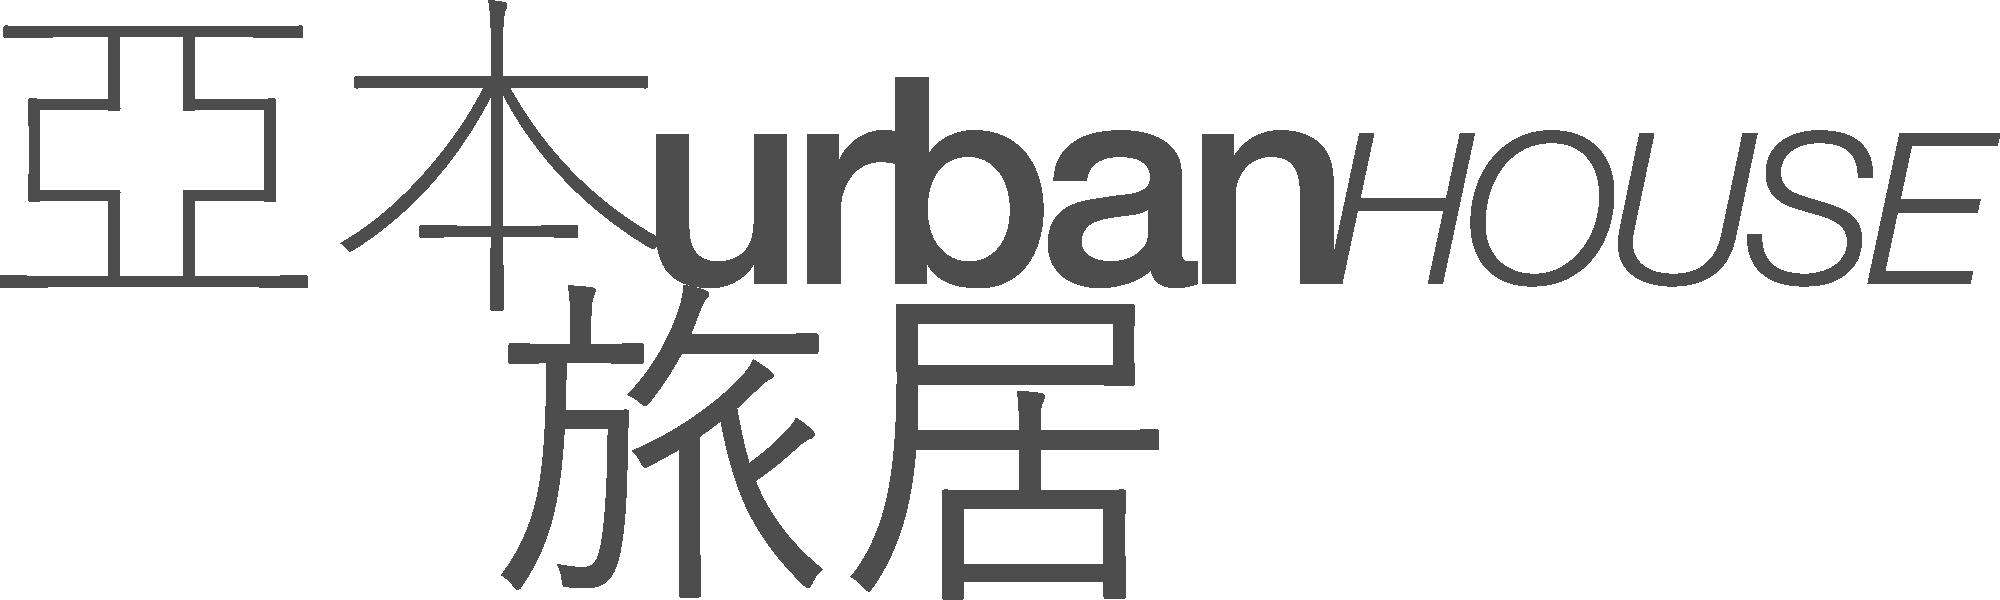 UrbanHOUSE